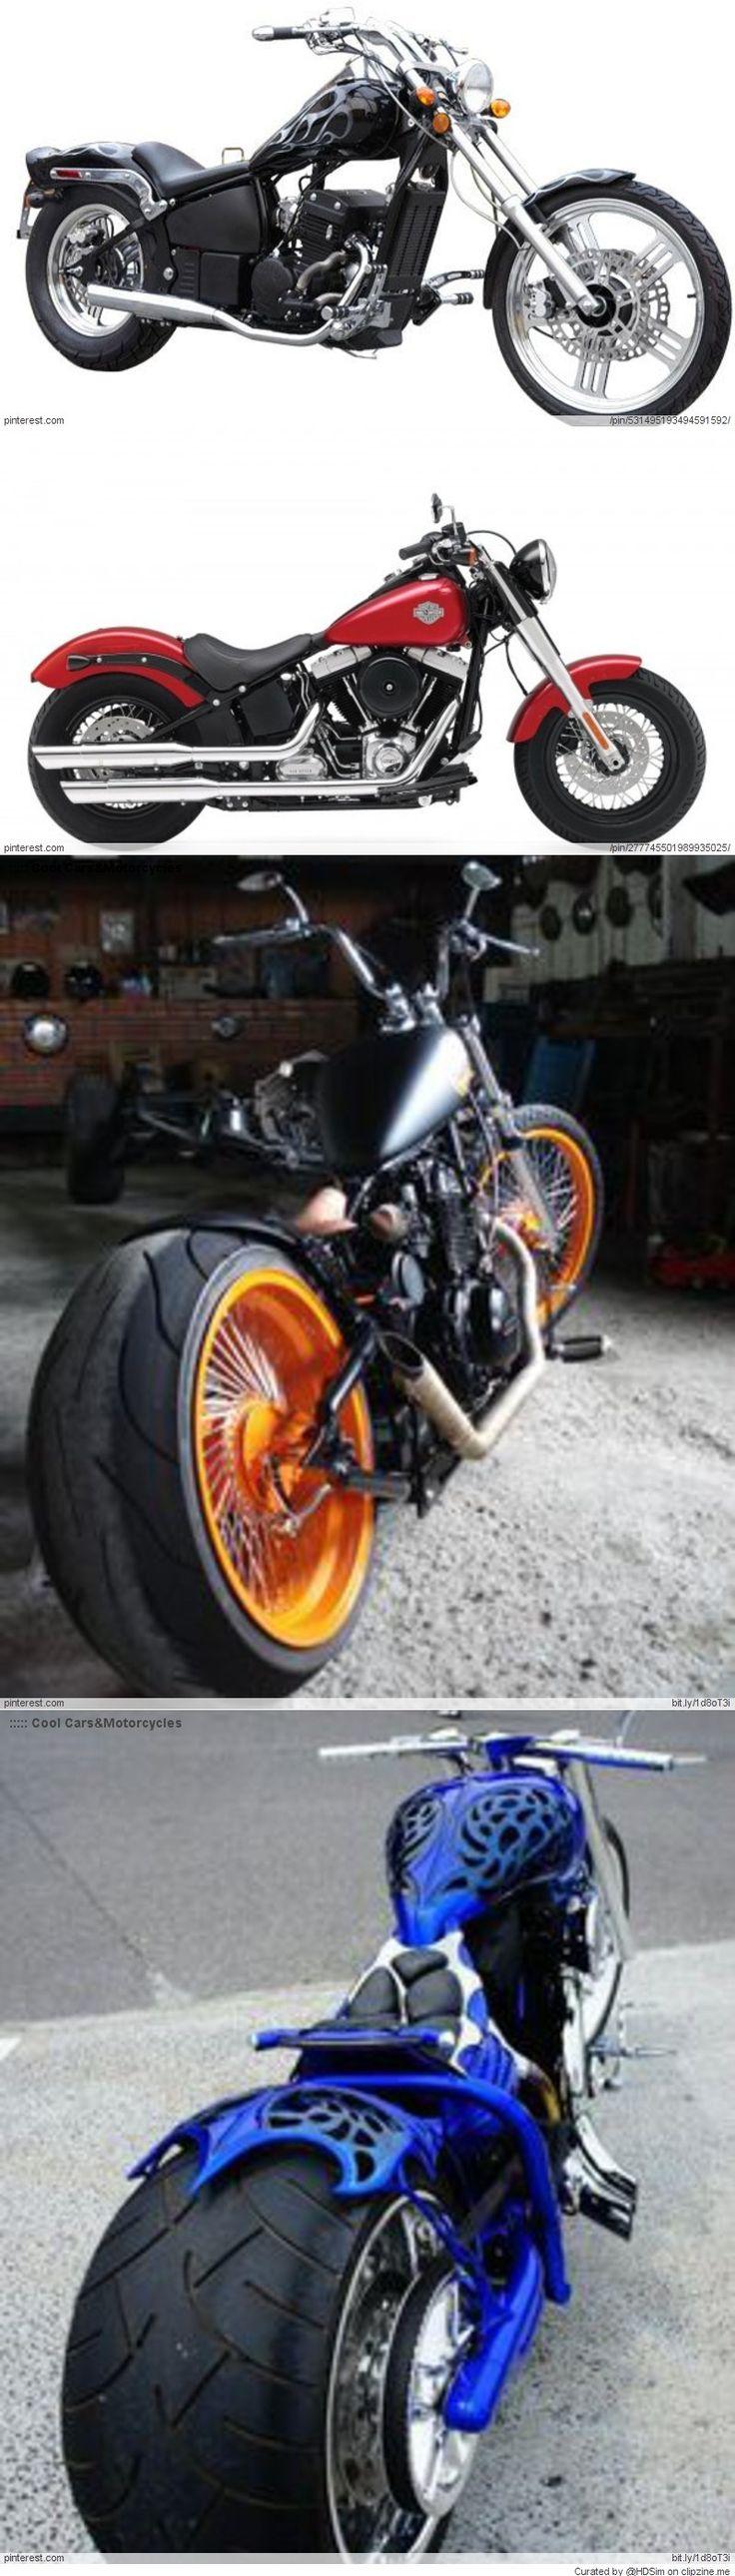 Suzuki hayabusa see more motorcycles